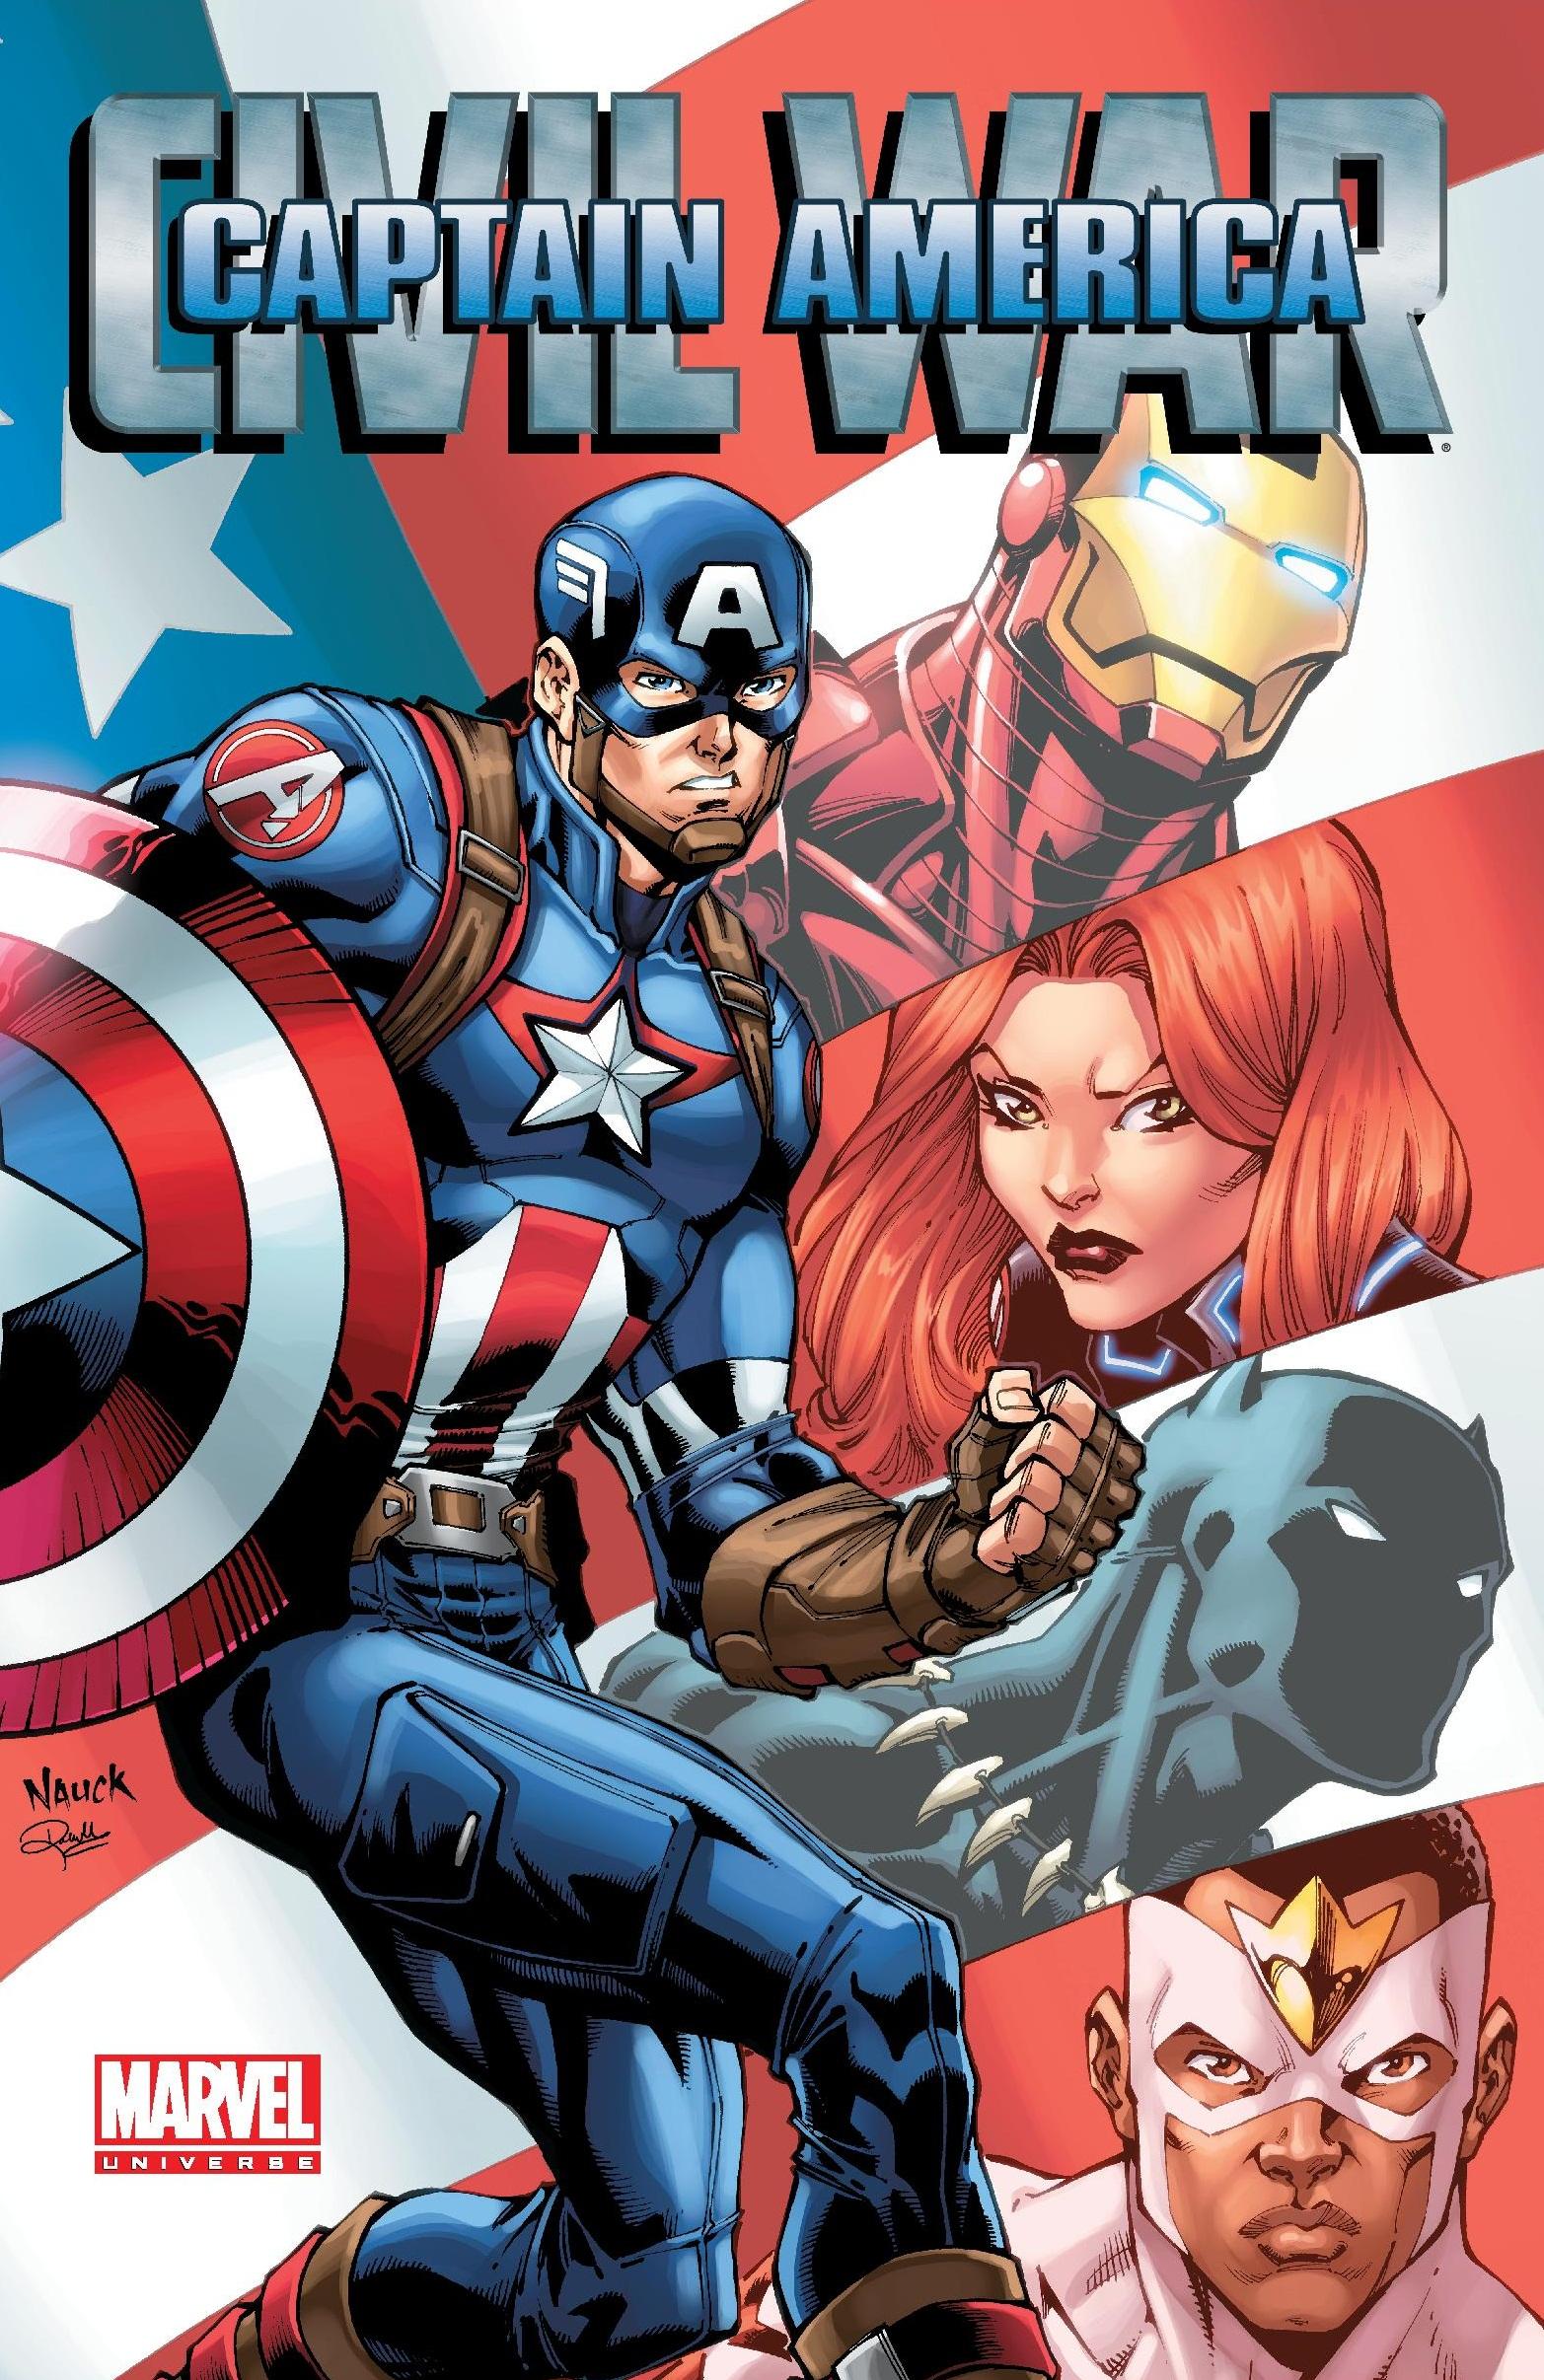 Marvel Universe Captain America: Civil War (Digest)